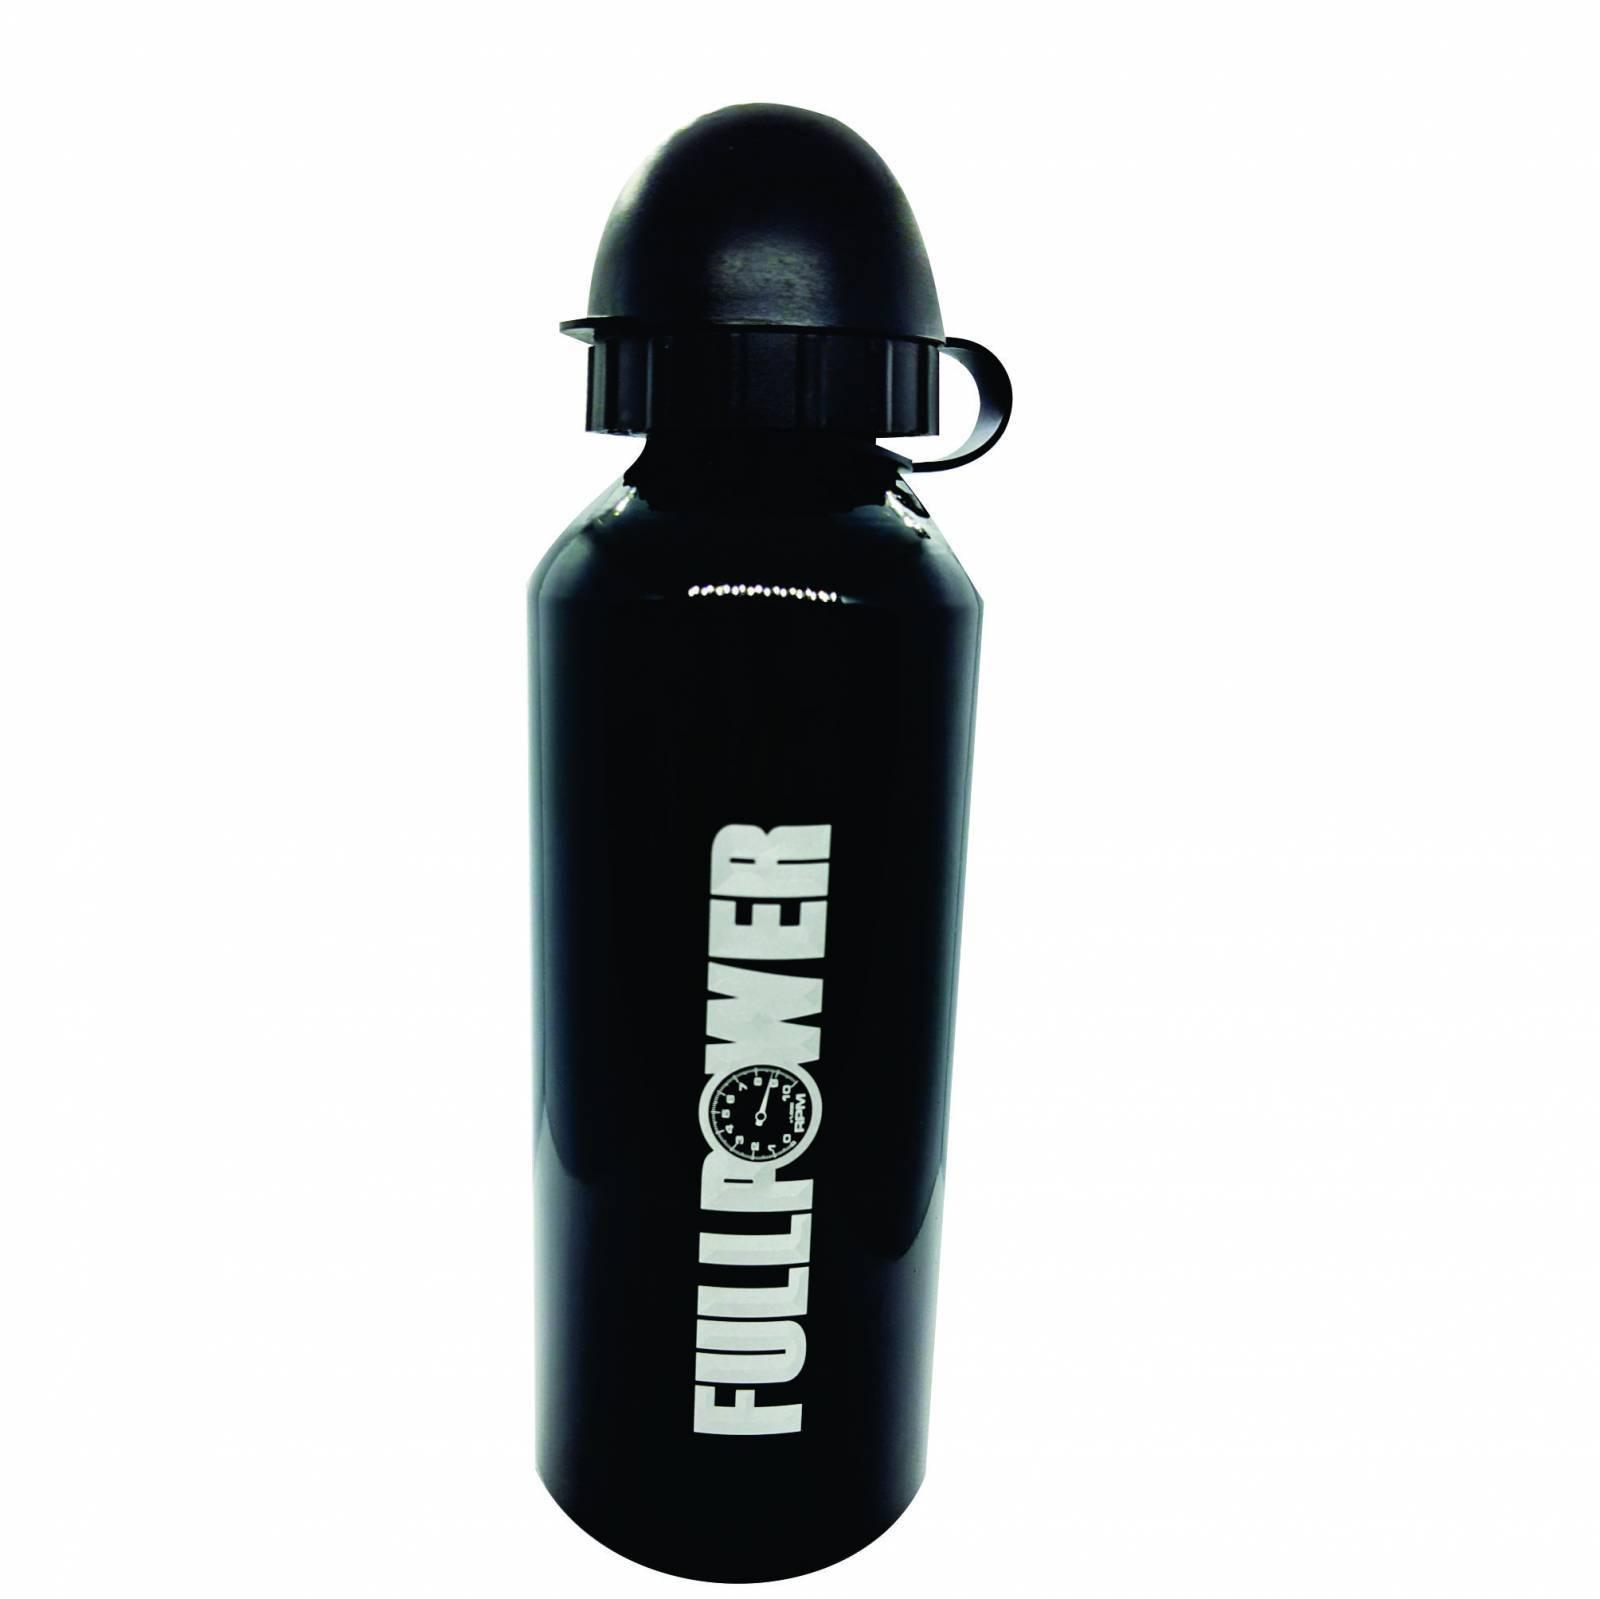 Squeeze Alumínio FullPower Preto 500ml - Loja FullPower